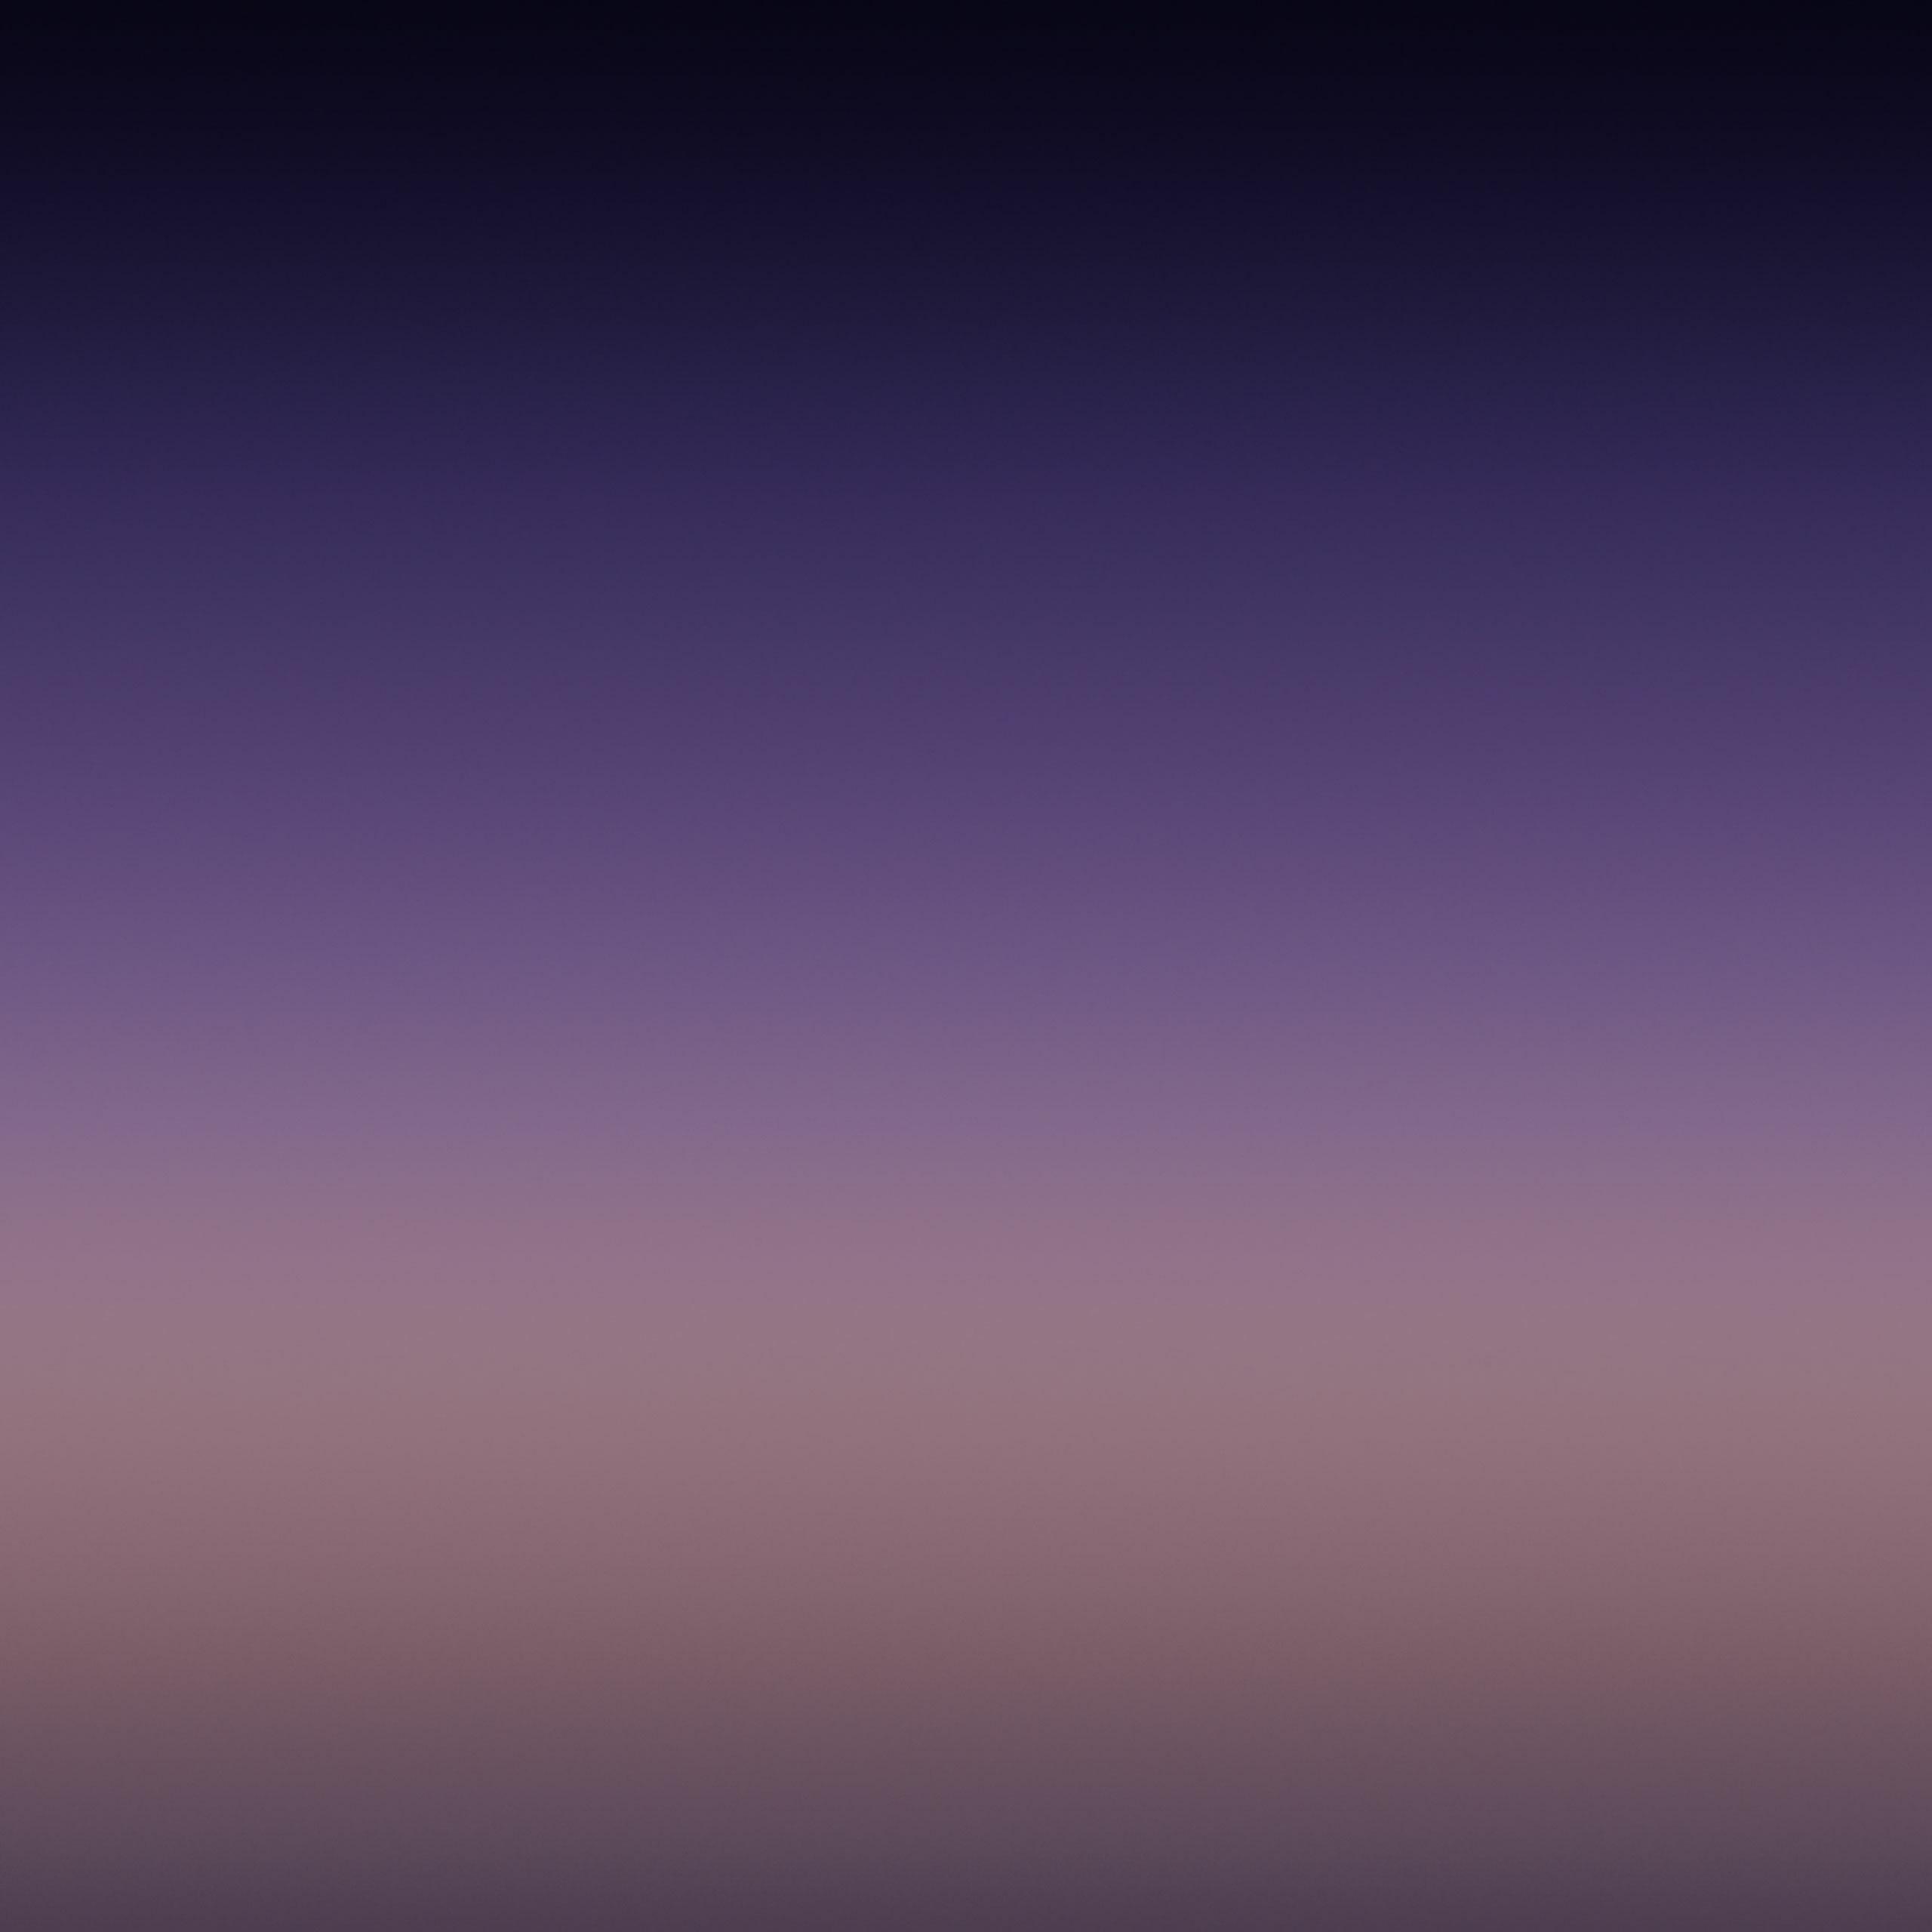 kece badai kamu bisa download wallpaper samsung galaxy